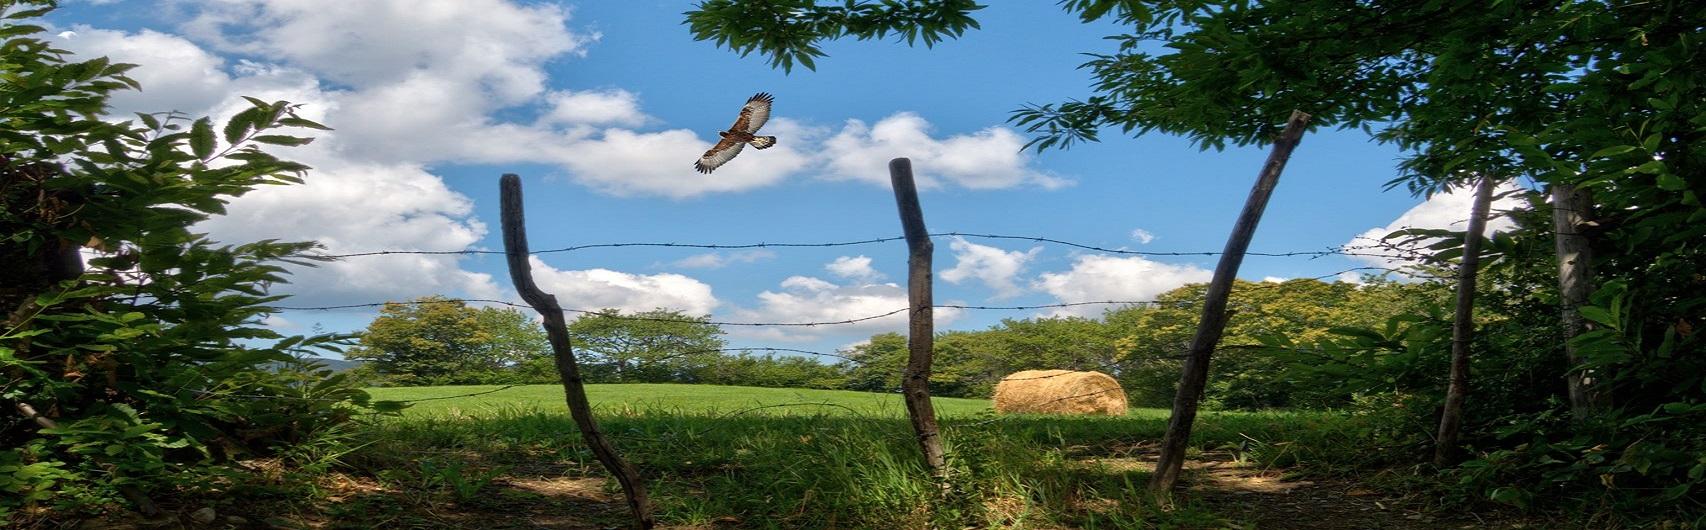 Slow Trekking Food - Aquile, boschi e prodotti spontanei